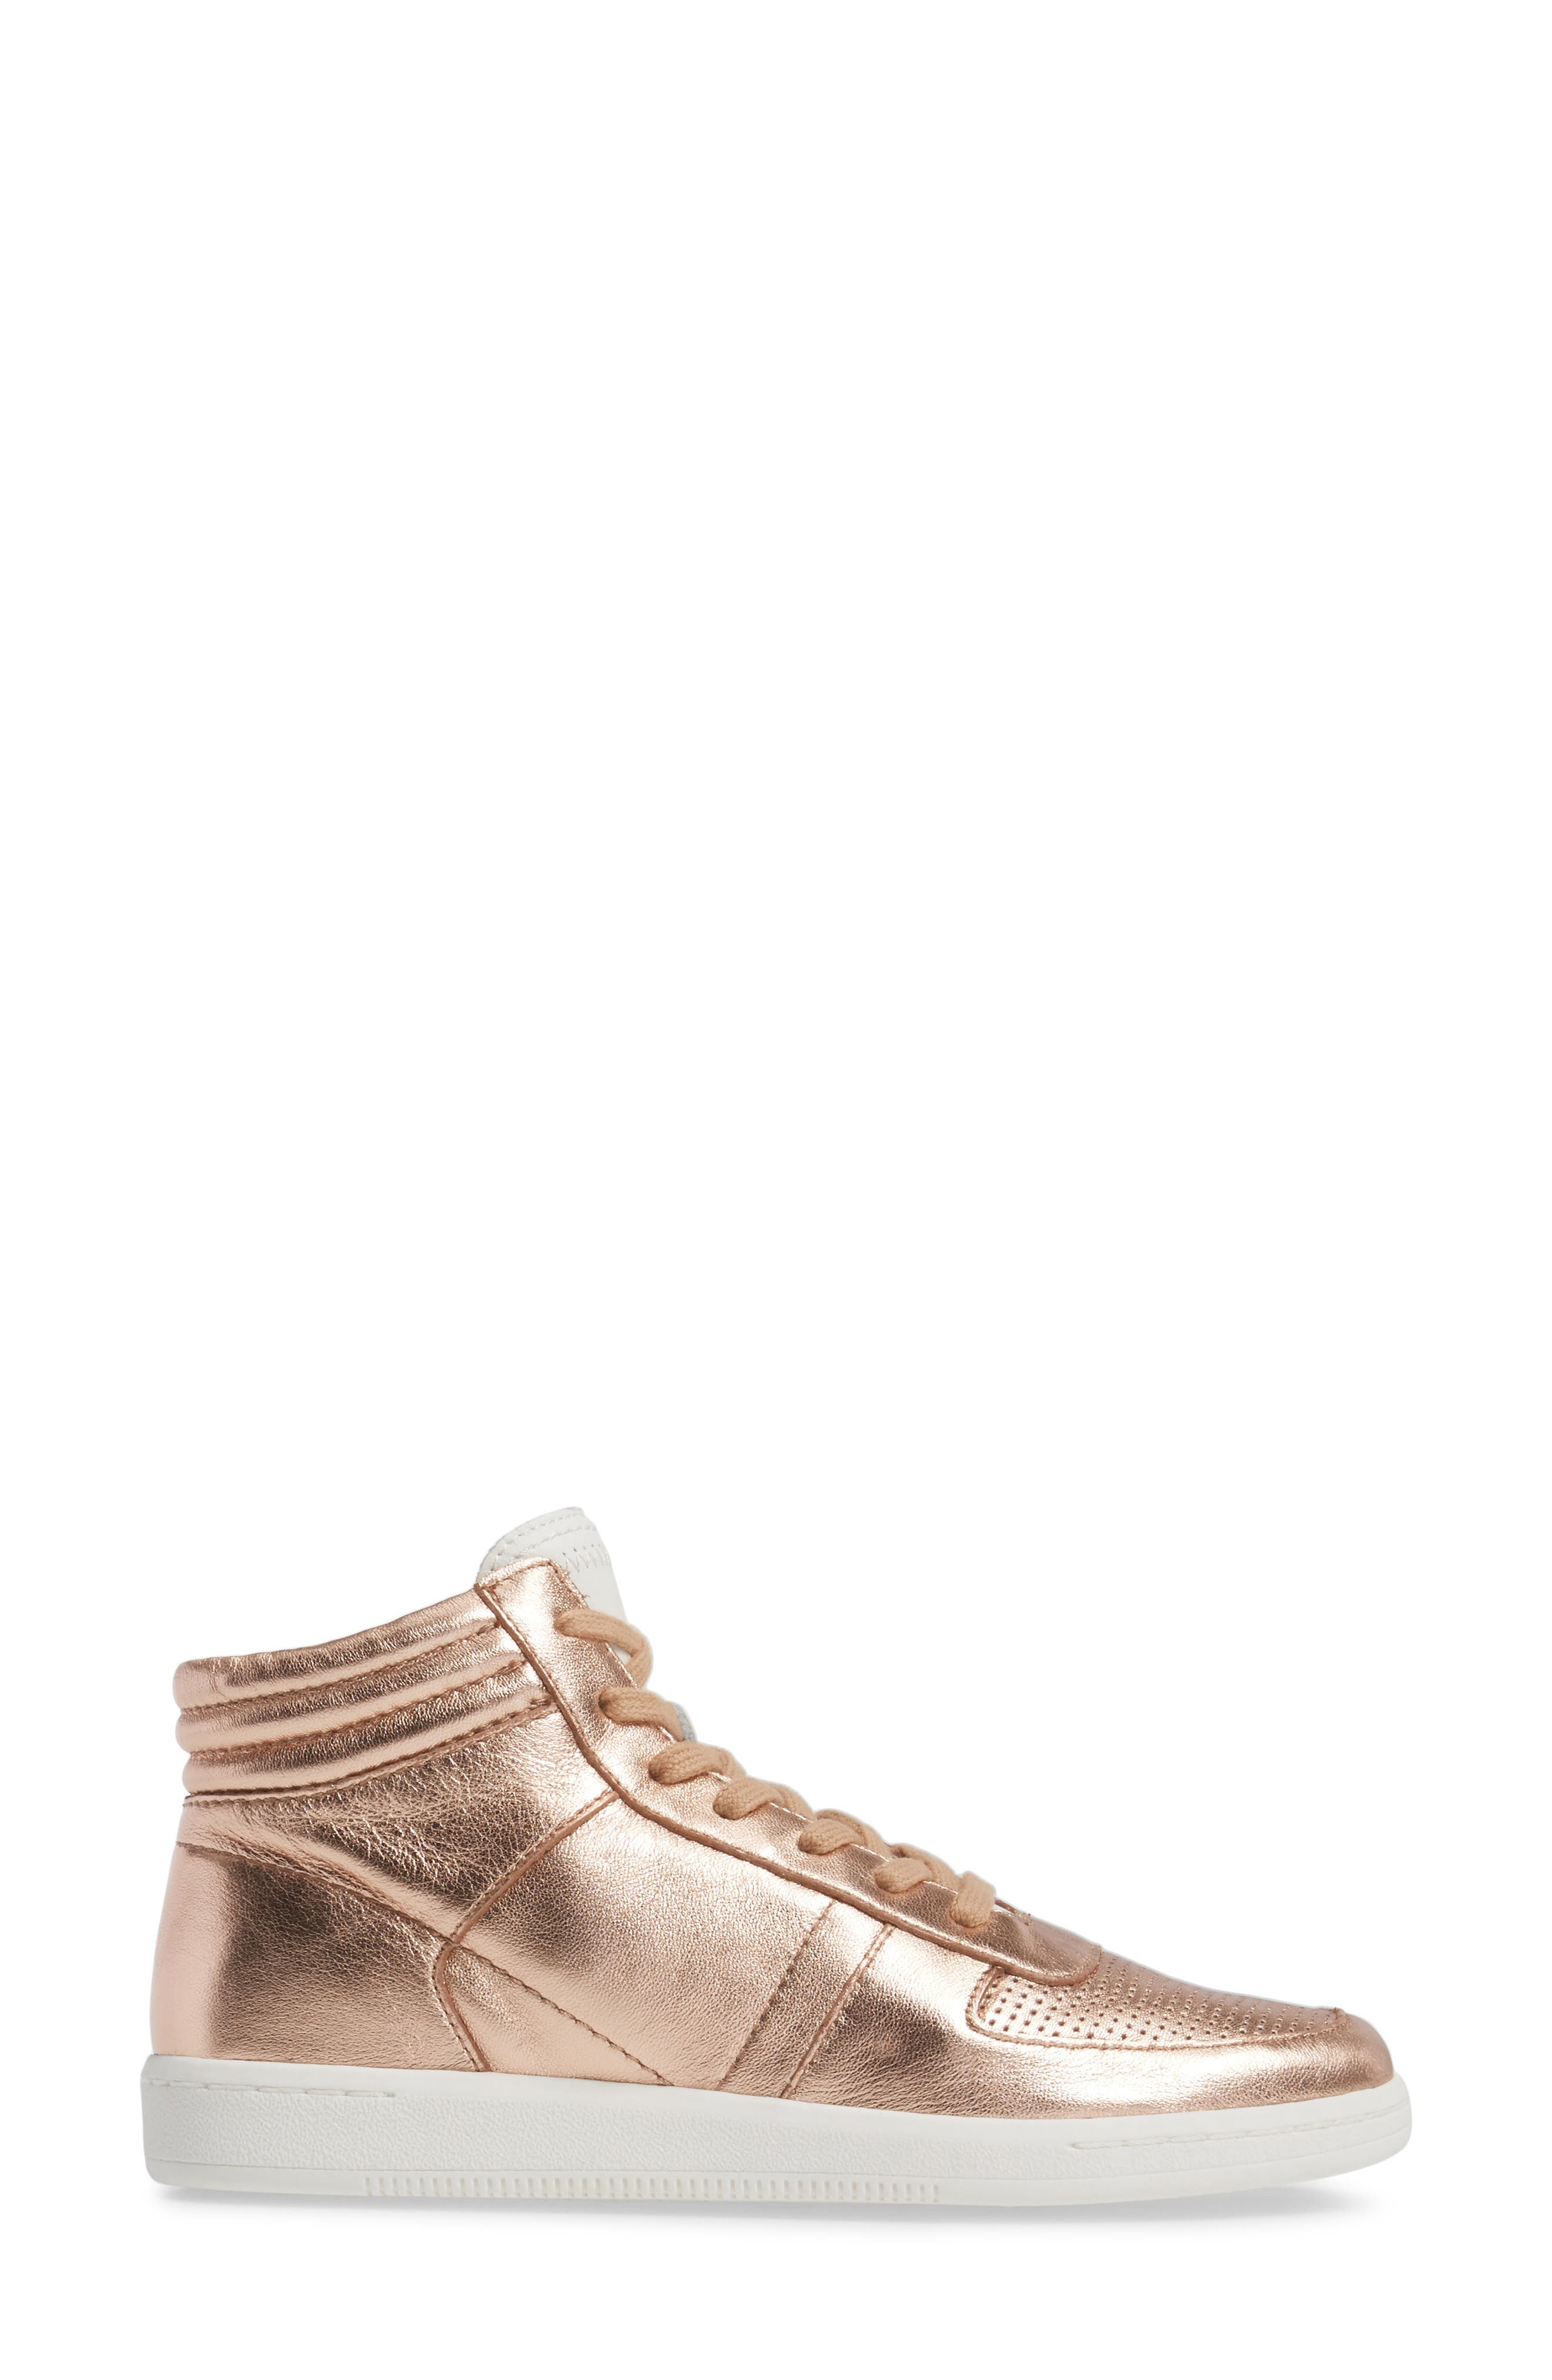 Alternate Image 3  - Dolce Vita Nate High Top Sneaker (Women)